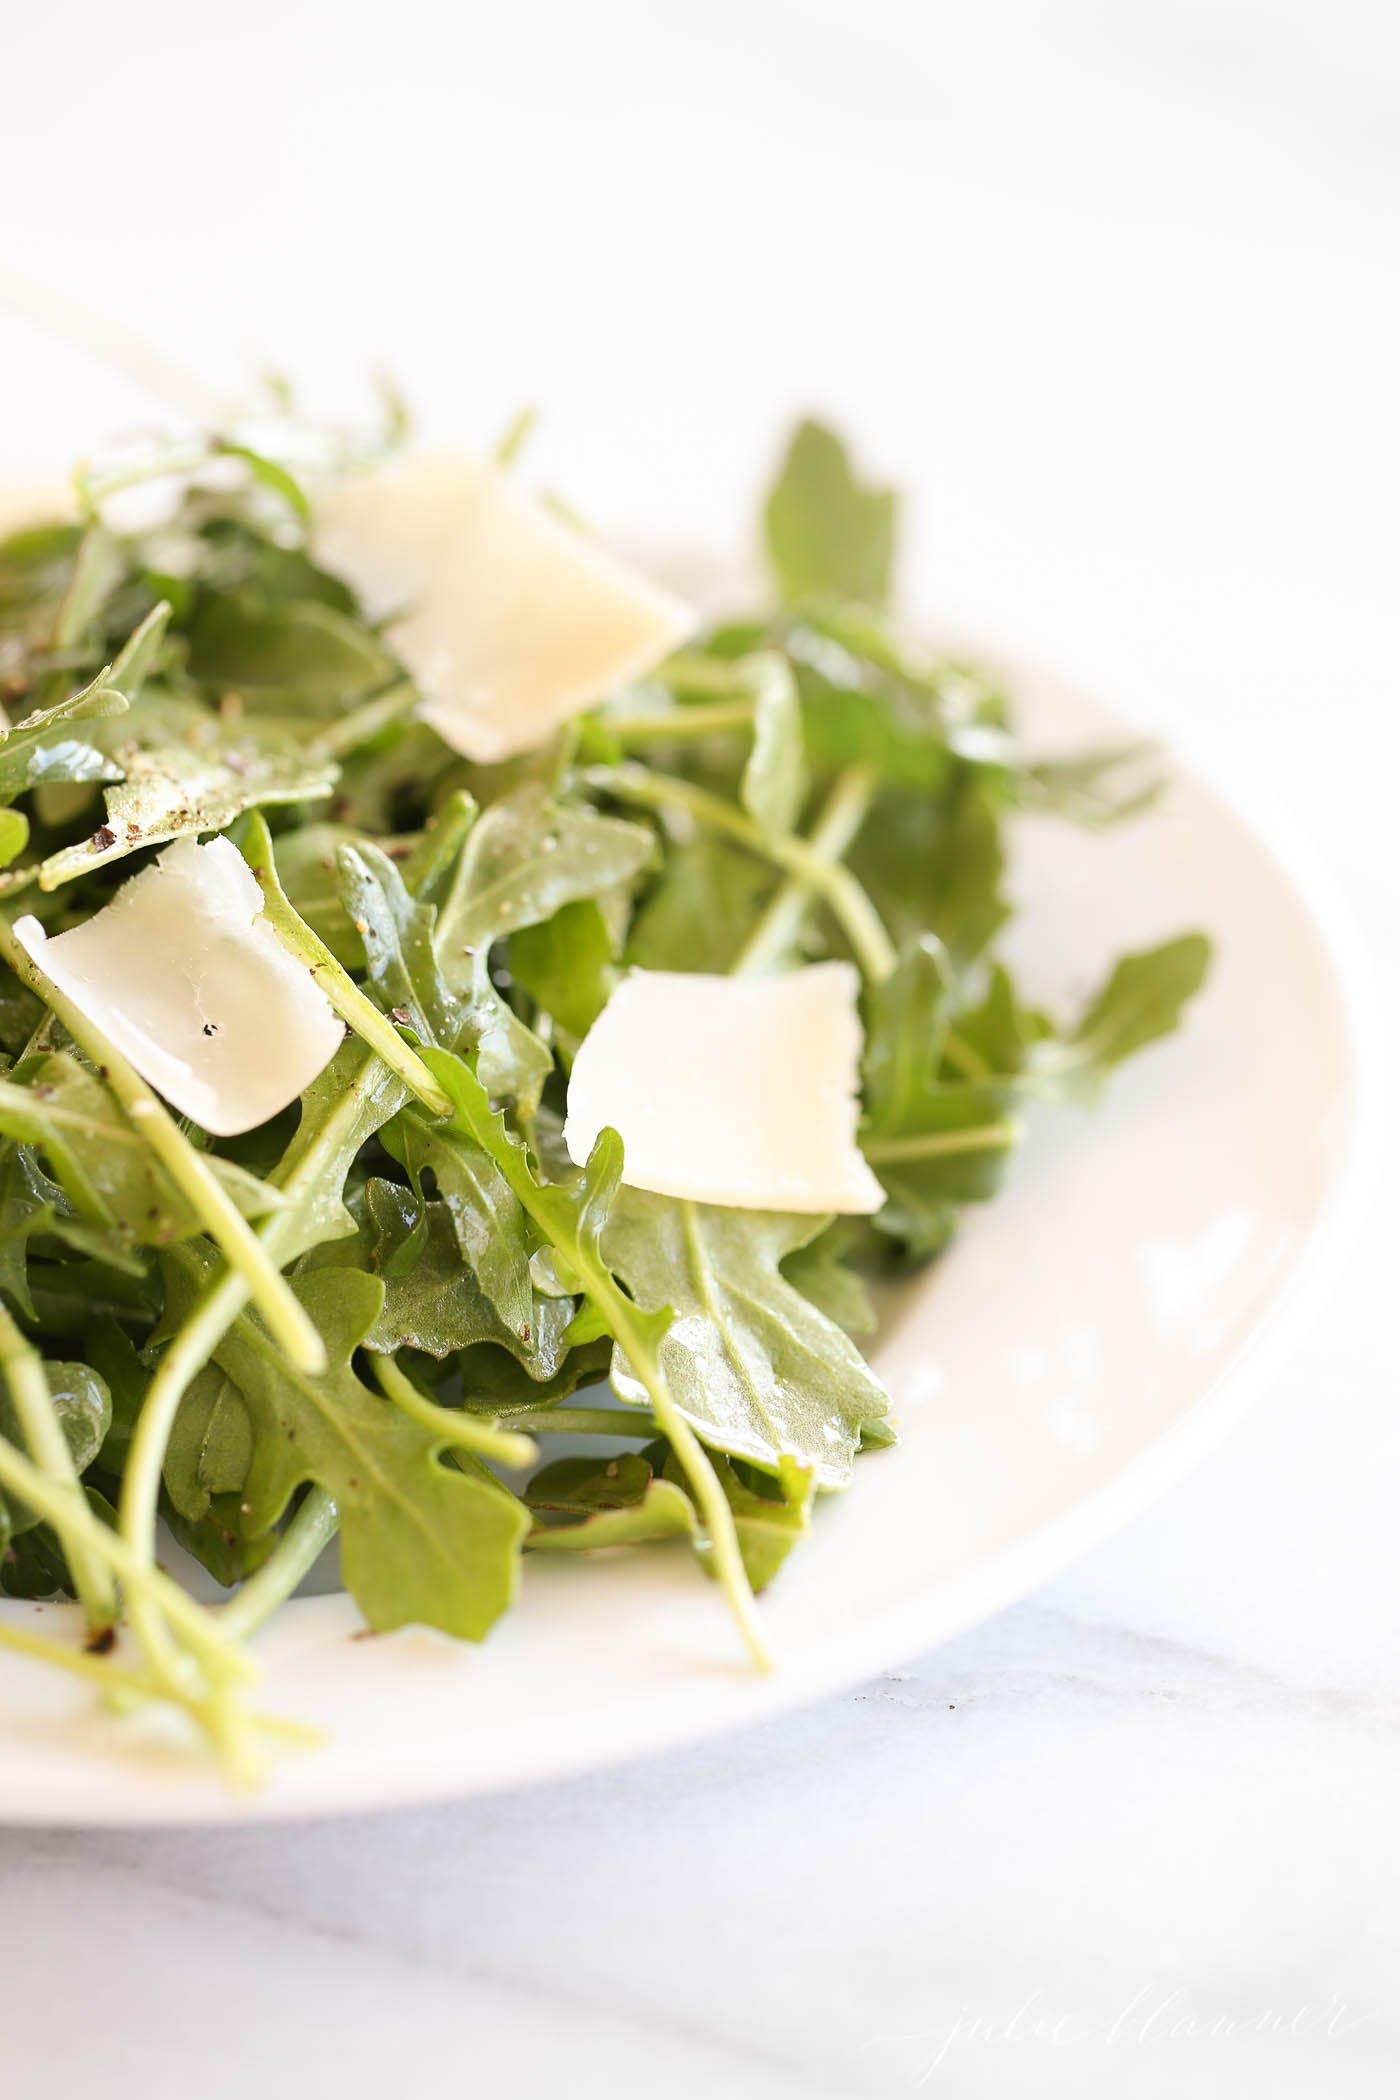 arugula salad with parmesan shavings and vinaigrette